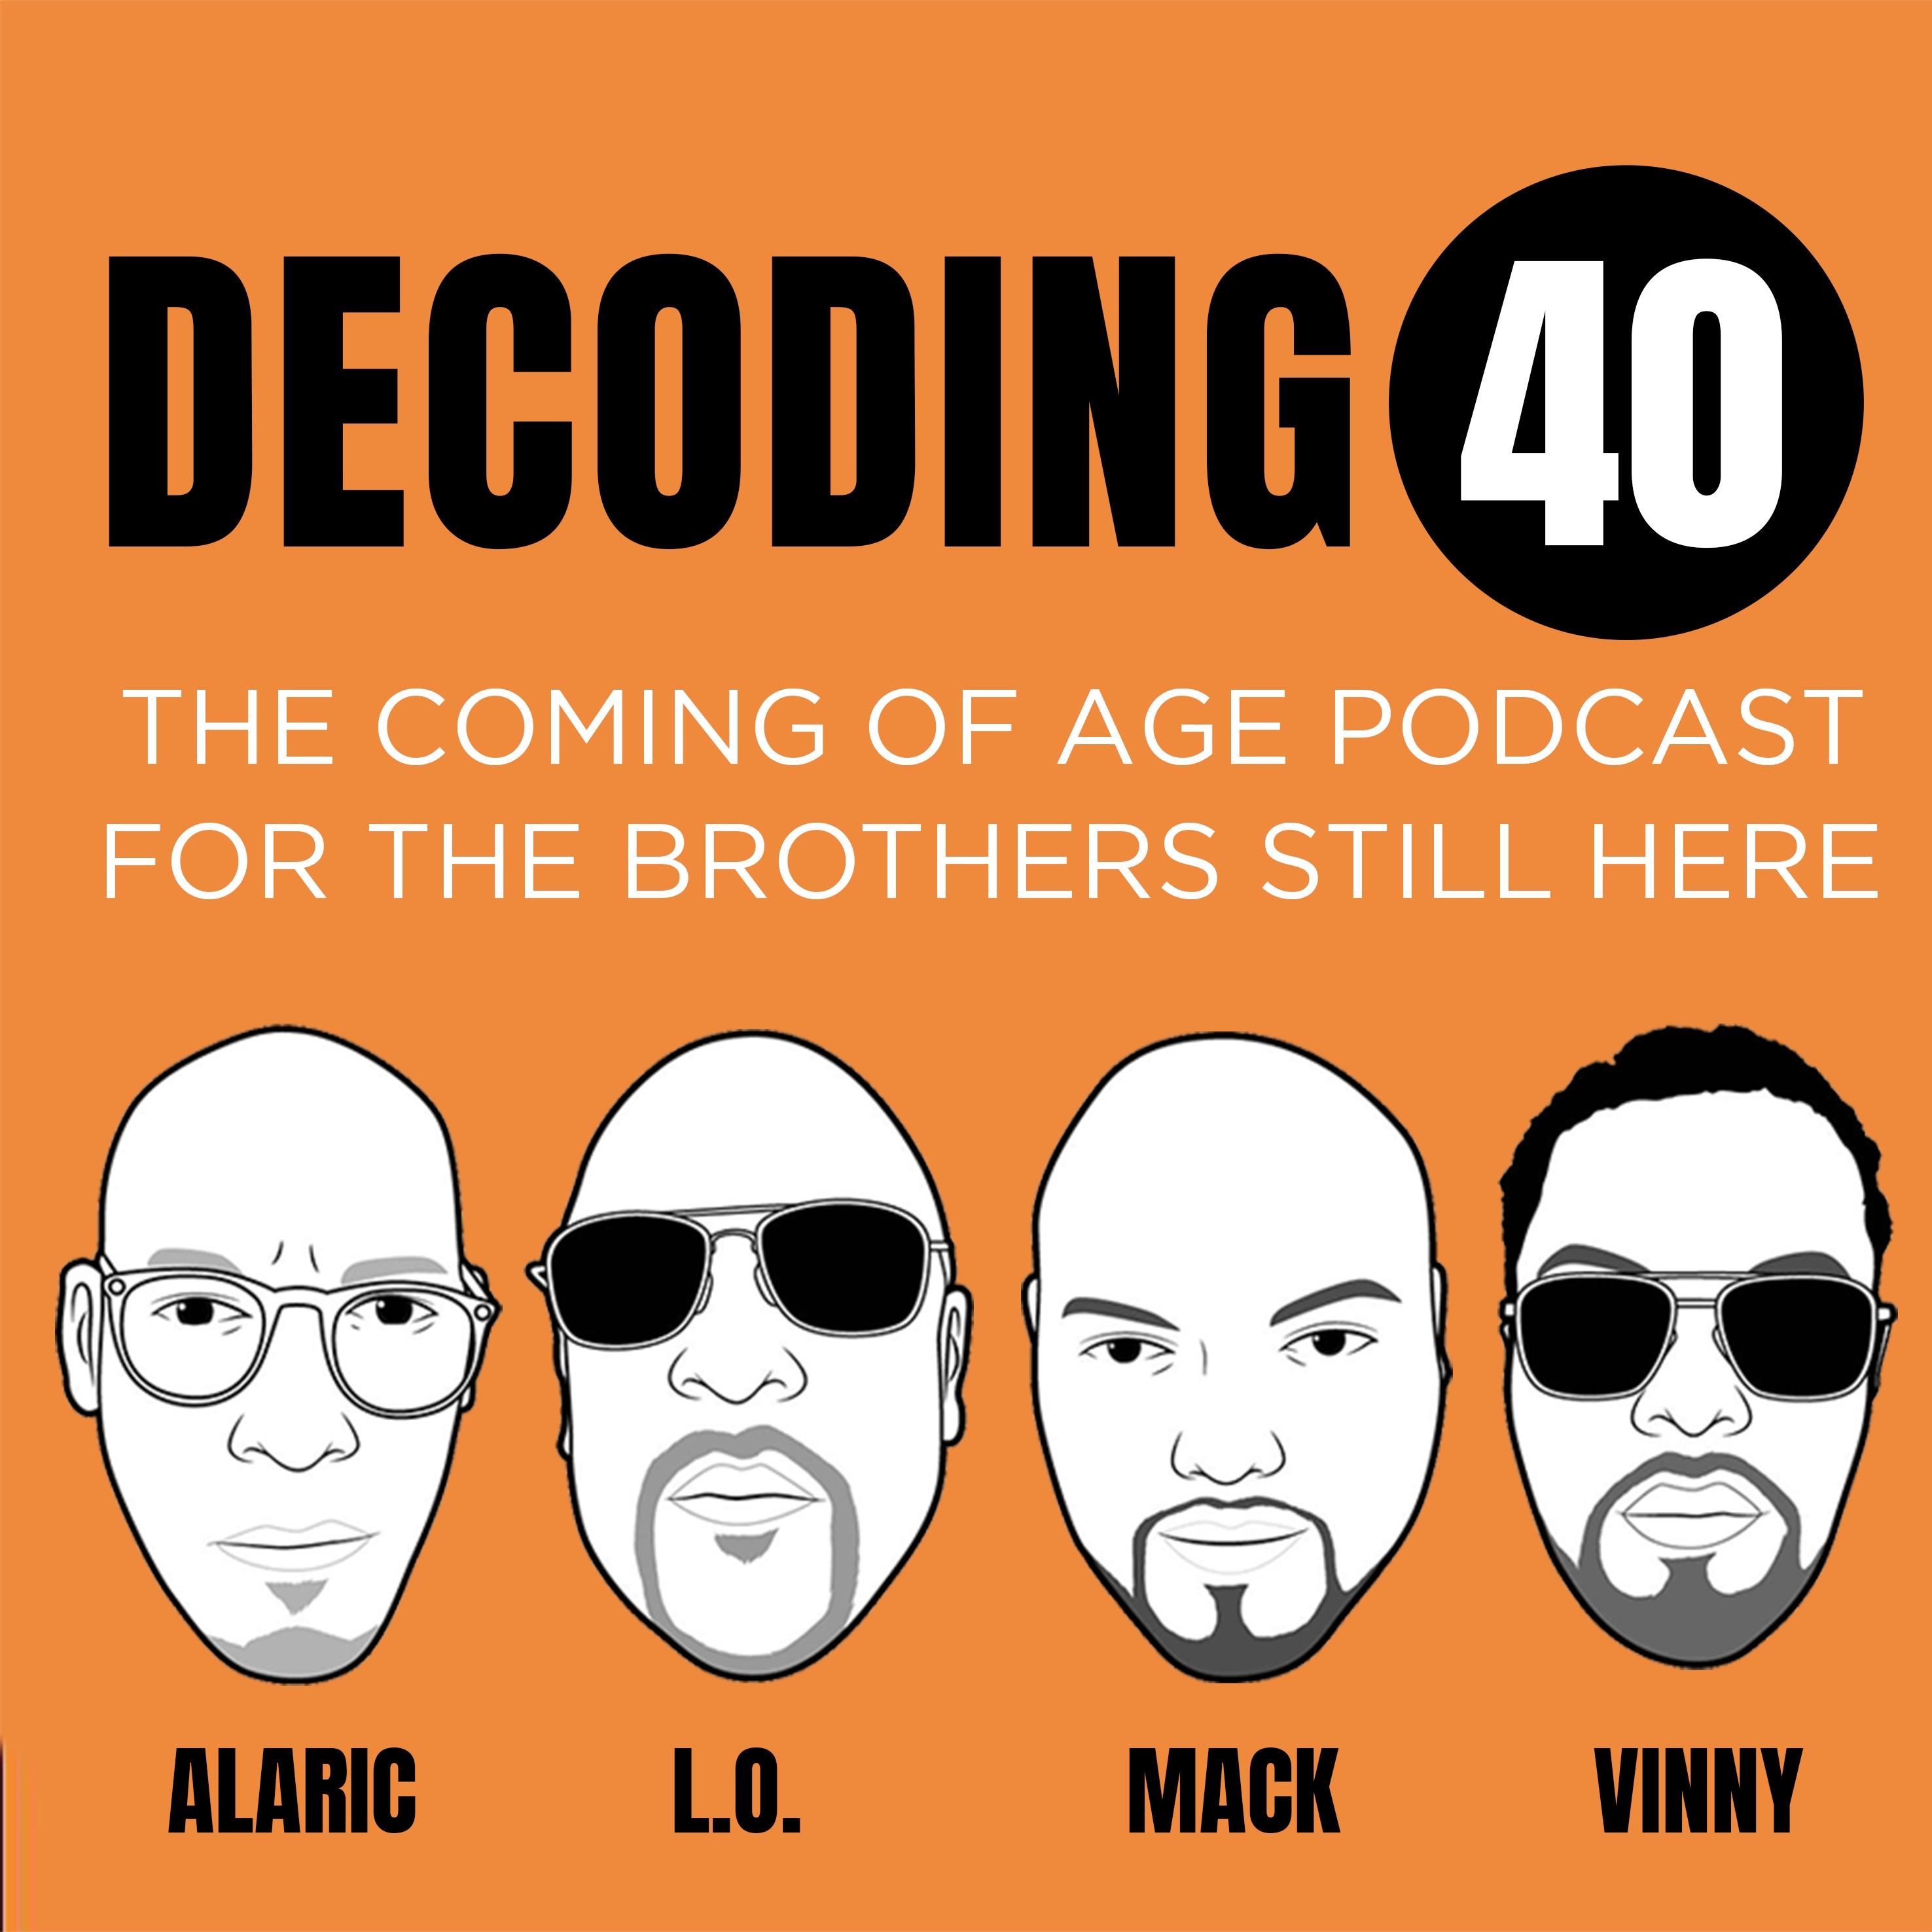 Decoding 40 show art